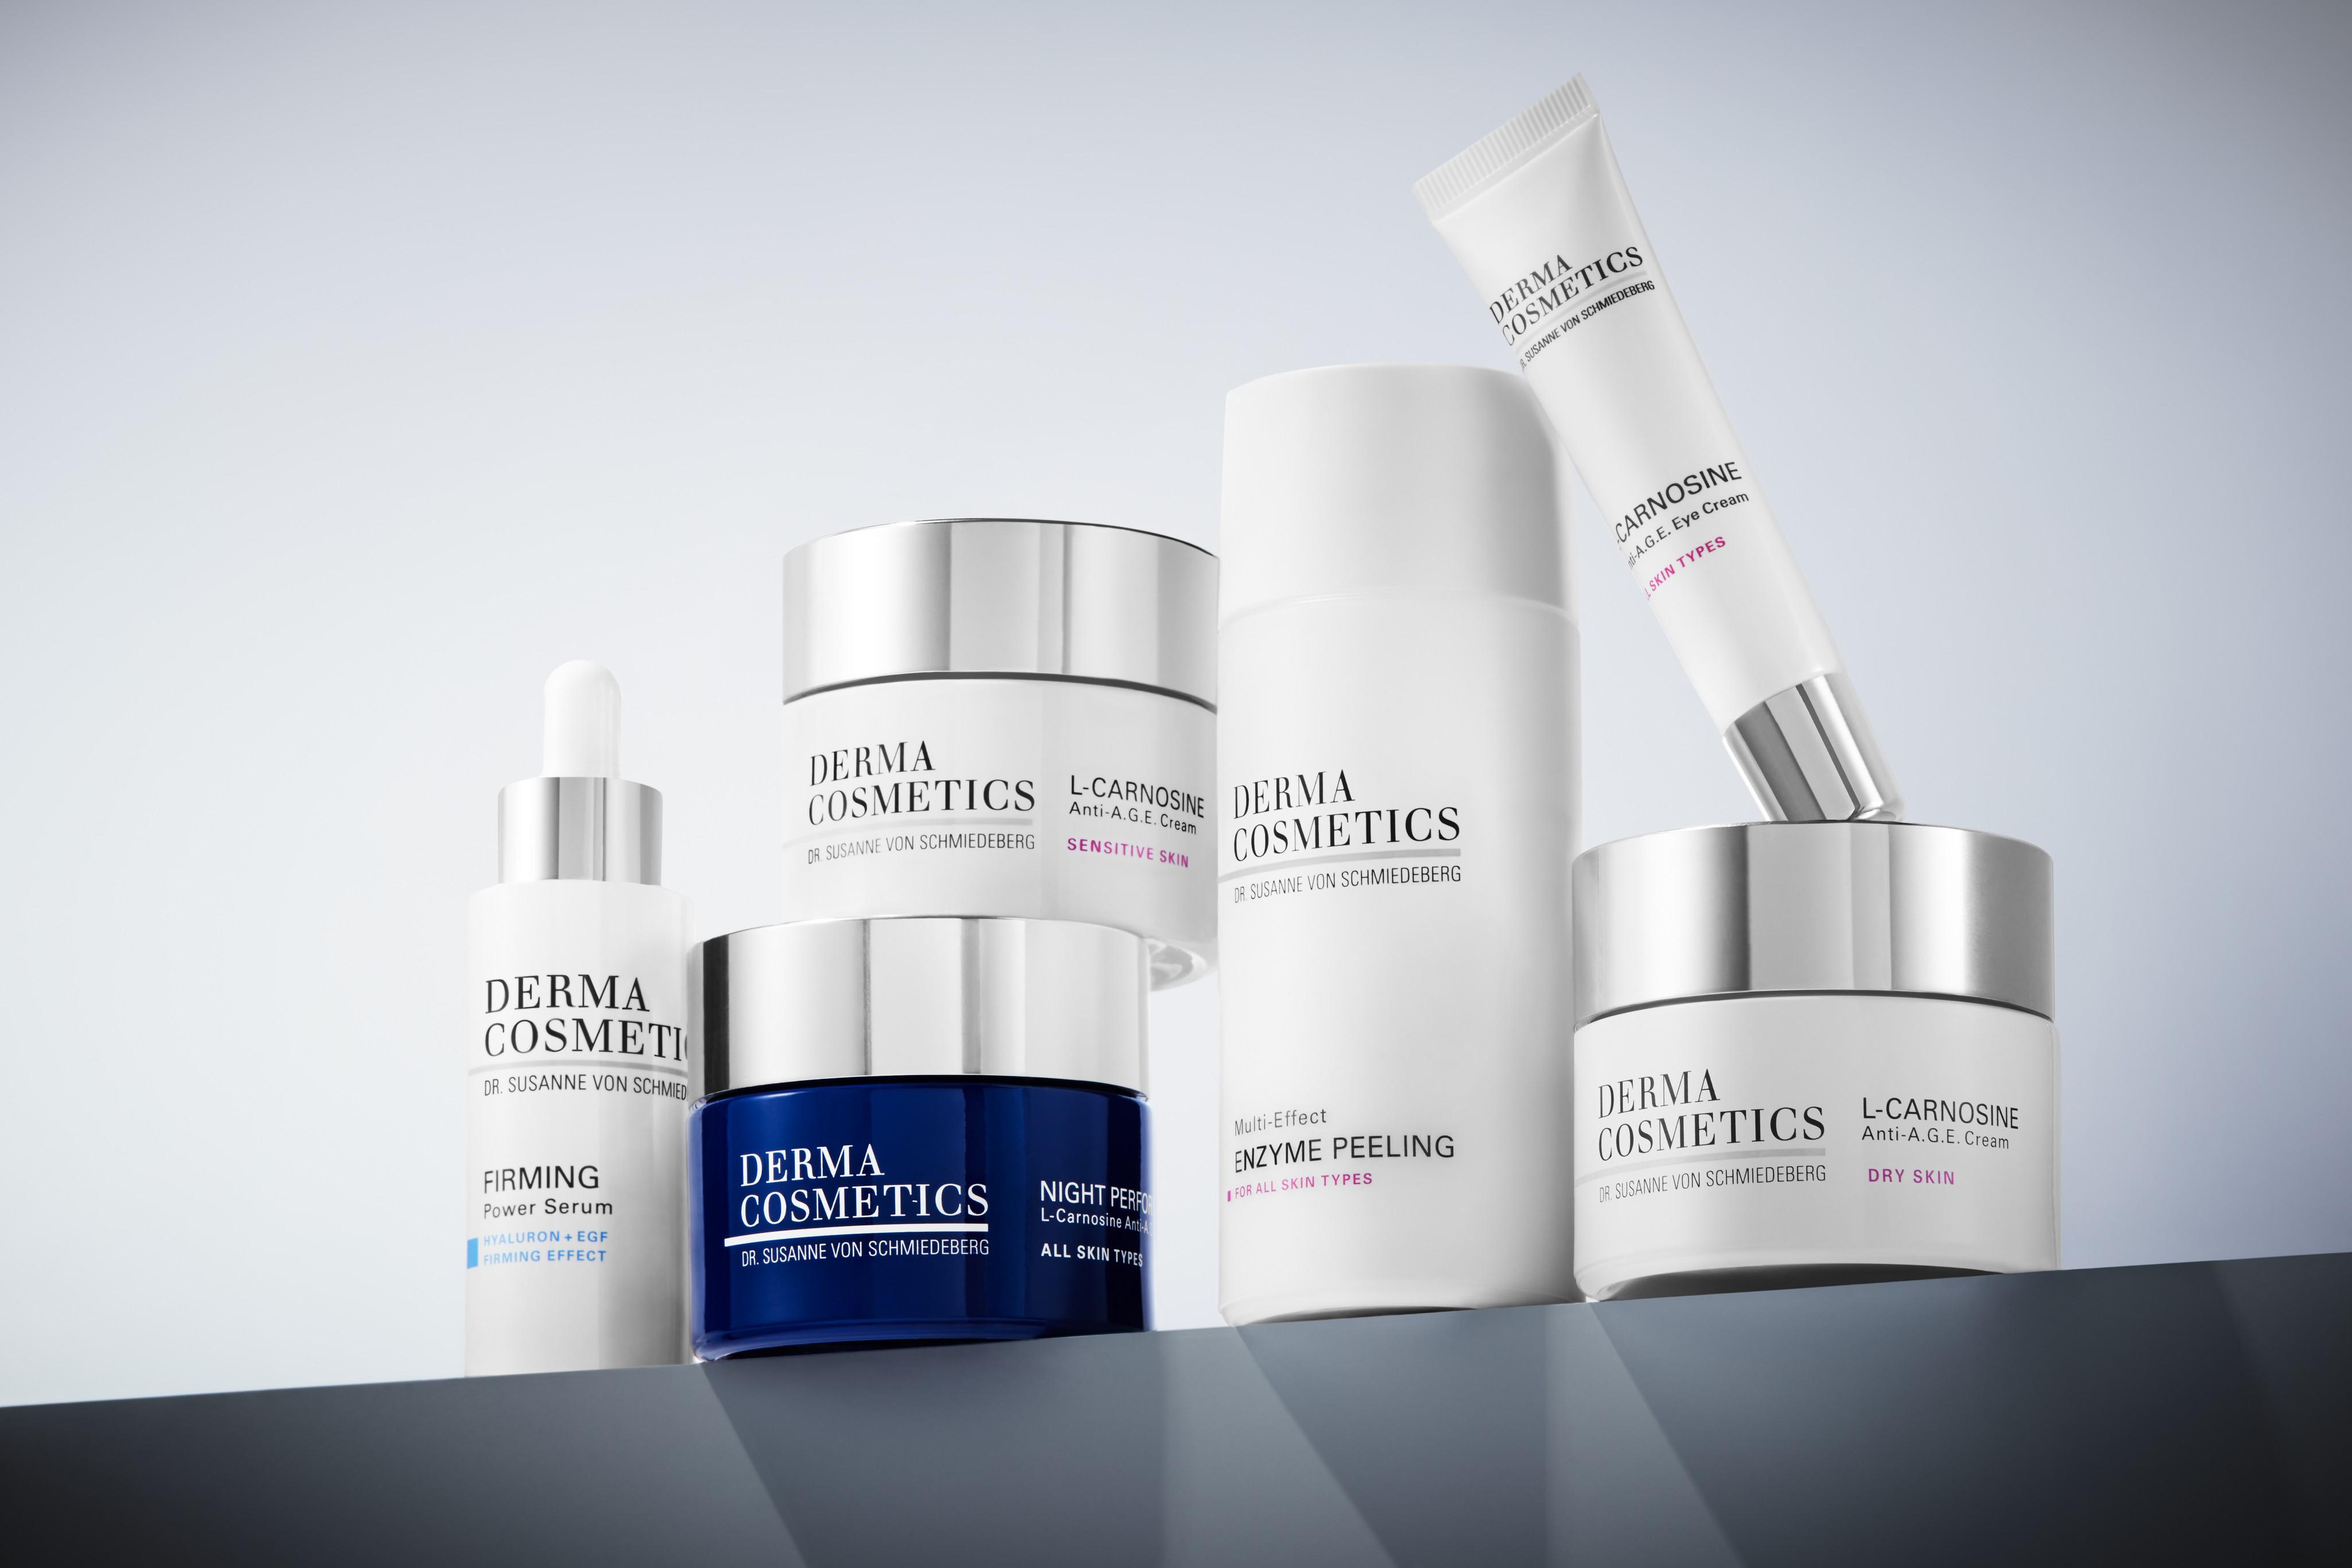 Skincare-product-dermacosmetics-bestseller-range-unlimited-Web-Rendition-1DvWv5NckrQpXe